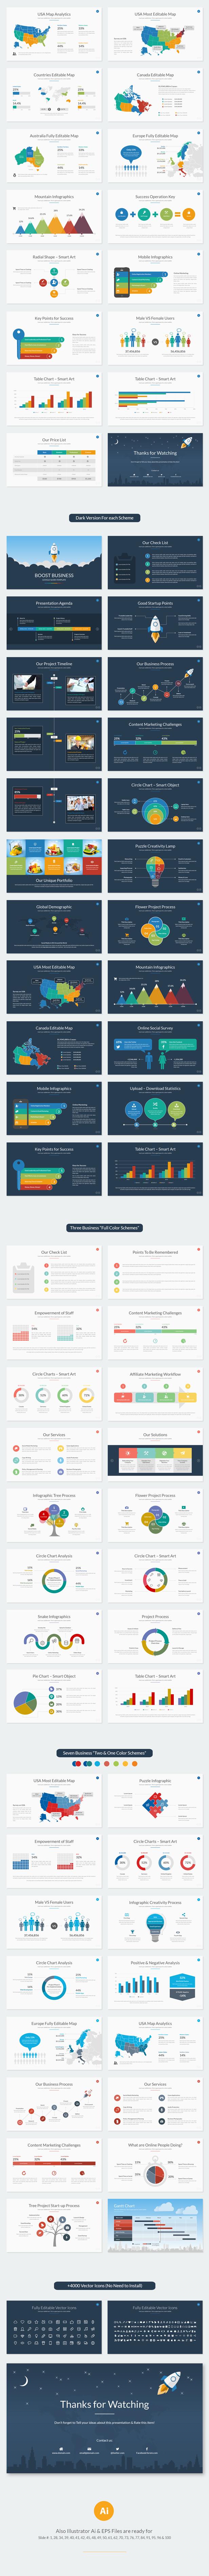 Boost Business Google Slides Template - 1